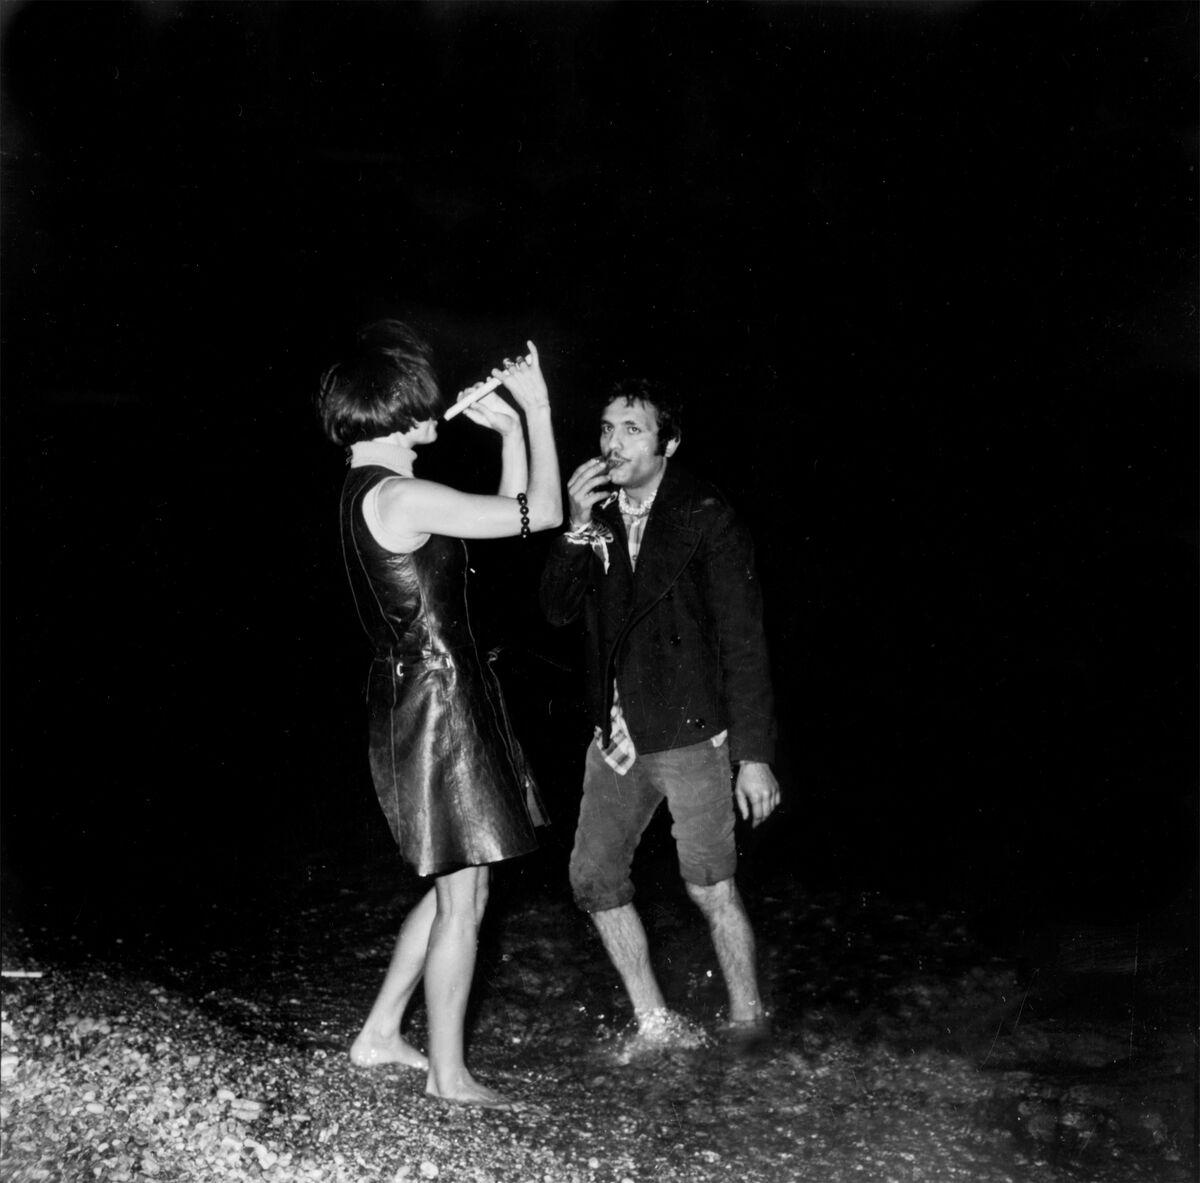 Anne Marie Boetti and Carmine Ableo improvising a small piffero and whistle concert on the Amalfi beach at Arte Povera, 1968. Photo by Bruno Manconi. Courtesy of Archivo Lia Rumma.